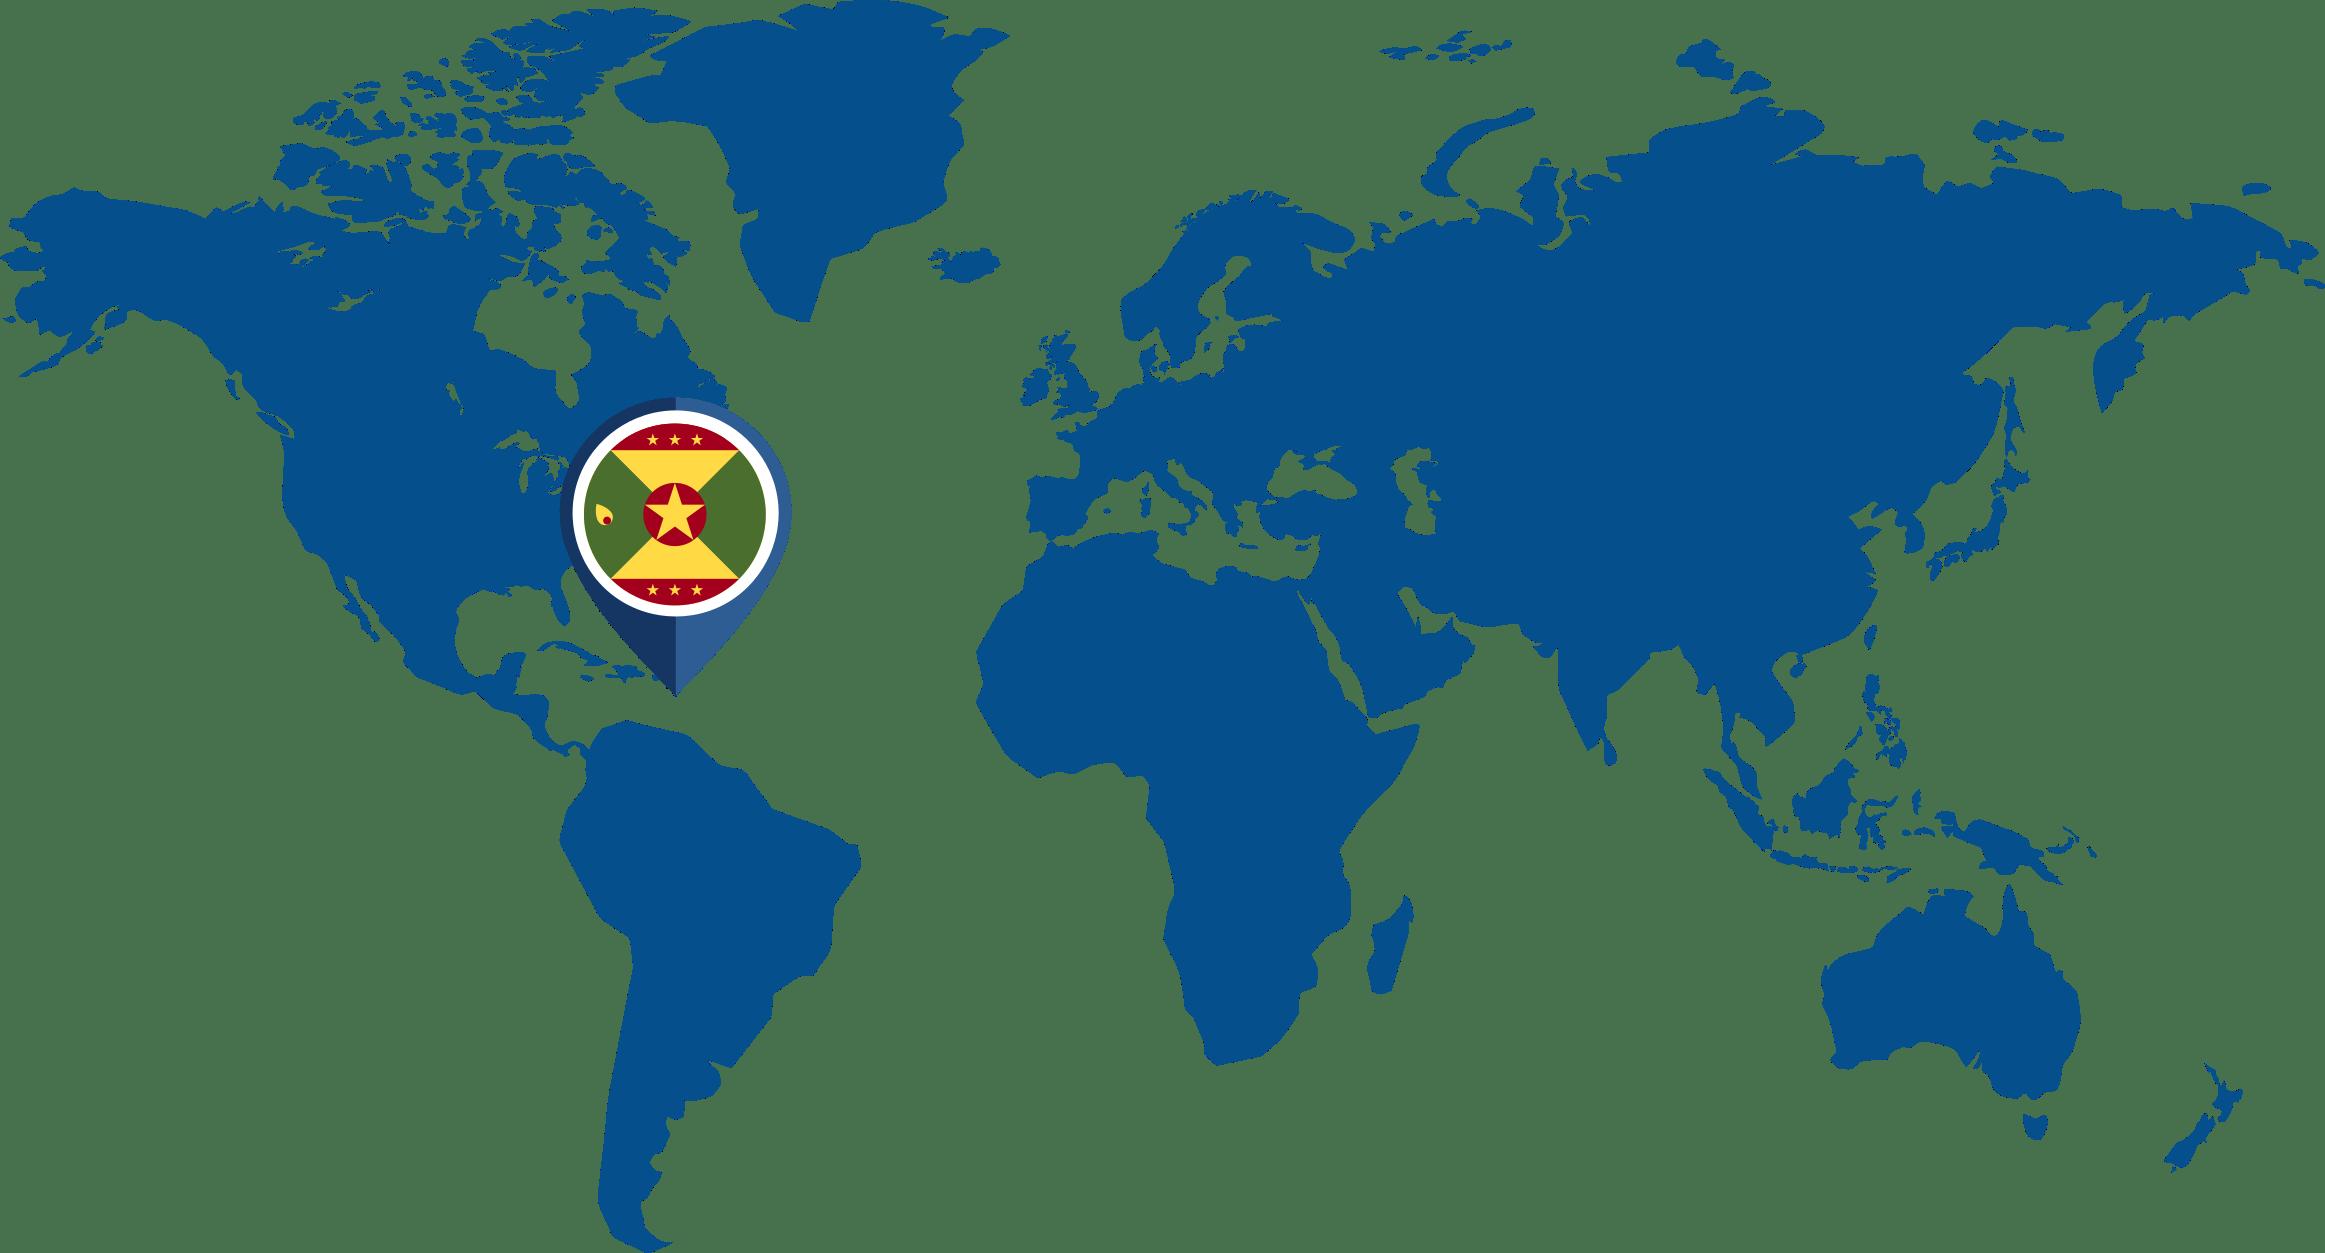 https://www.bluemina.com/wp-content/uploads/2020/02/Grenada-Location.png